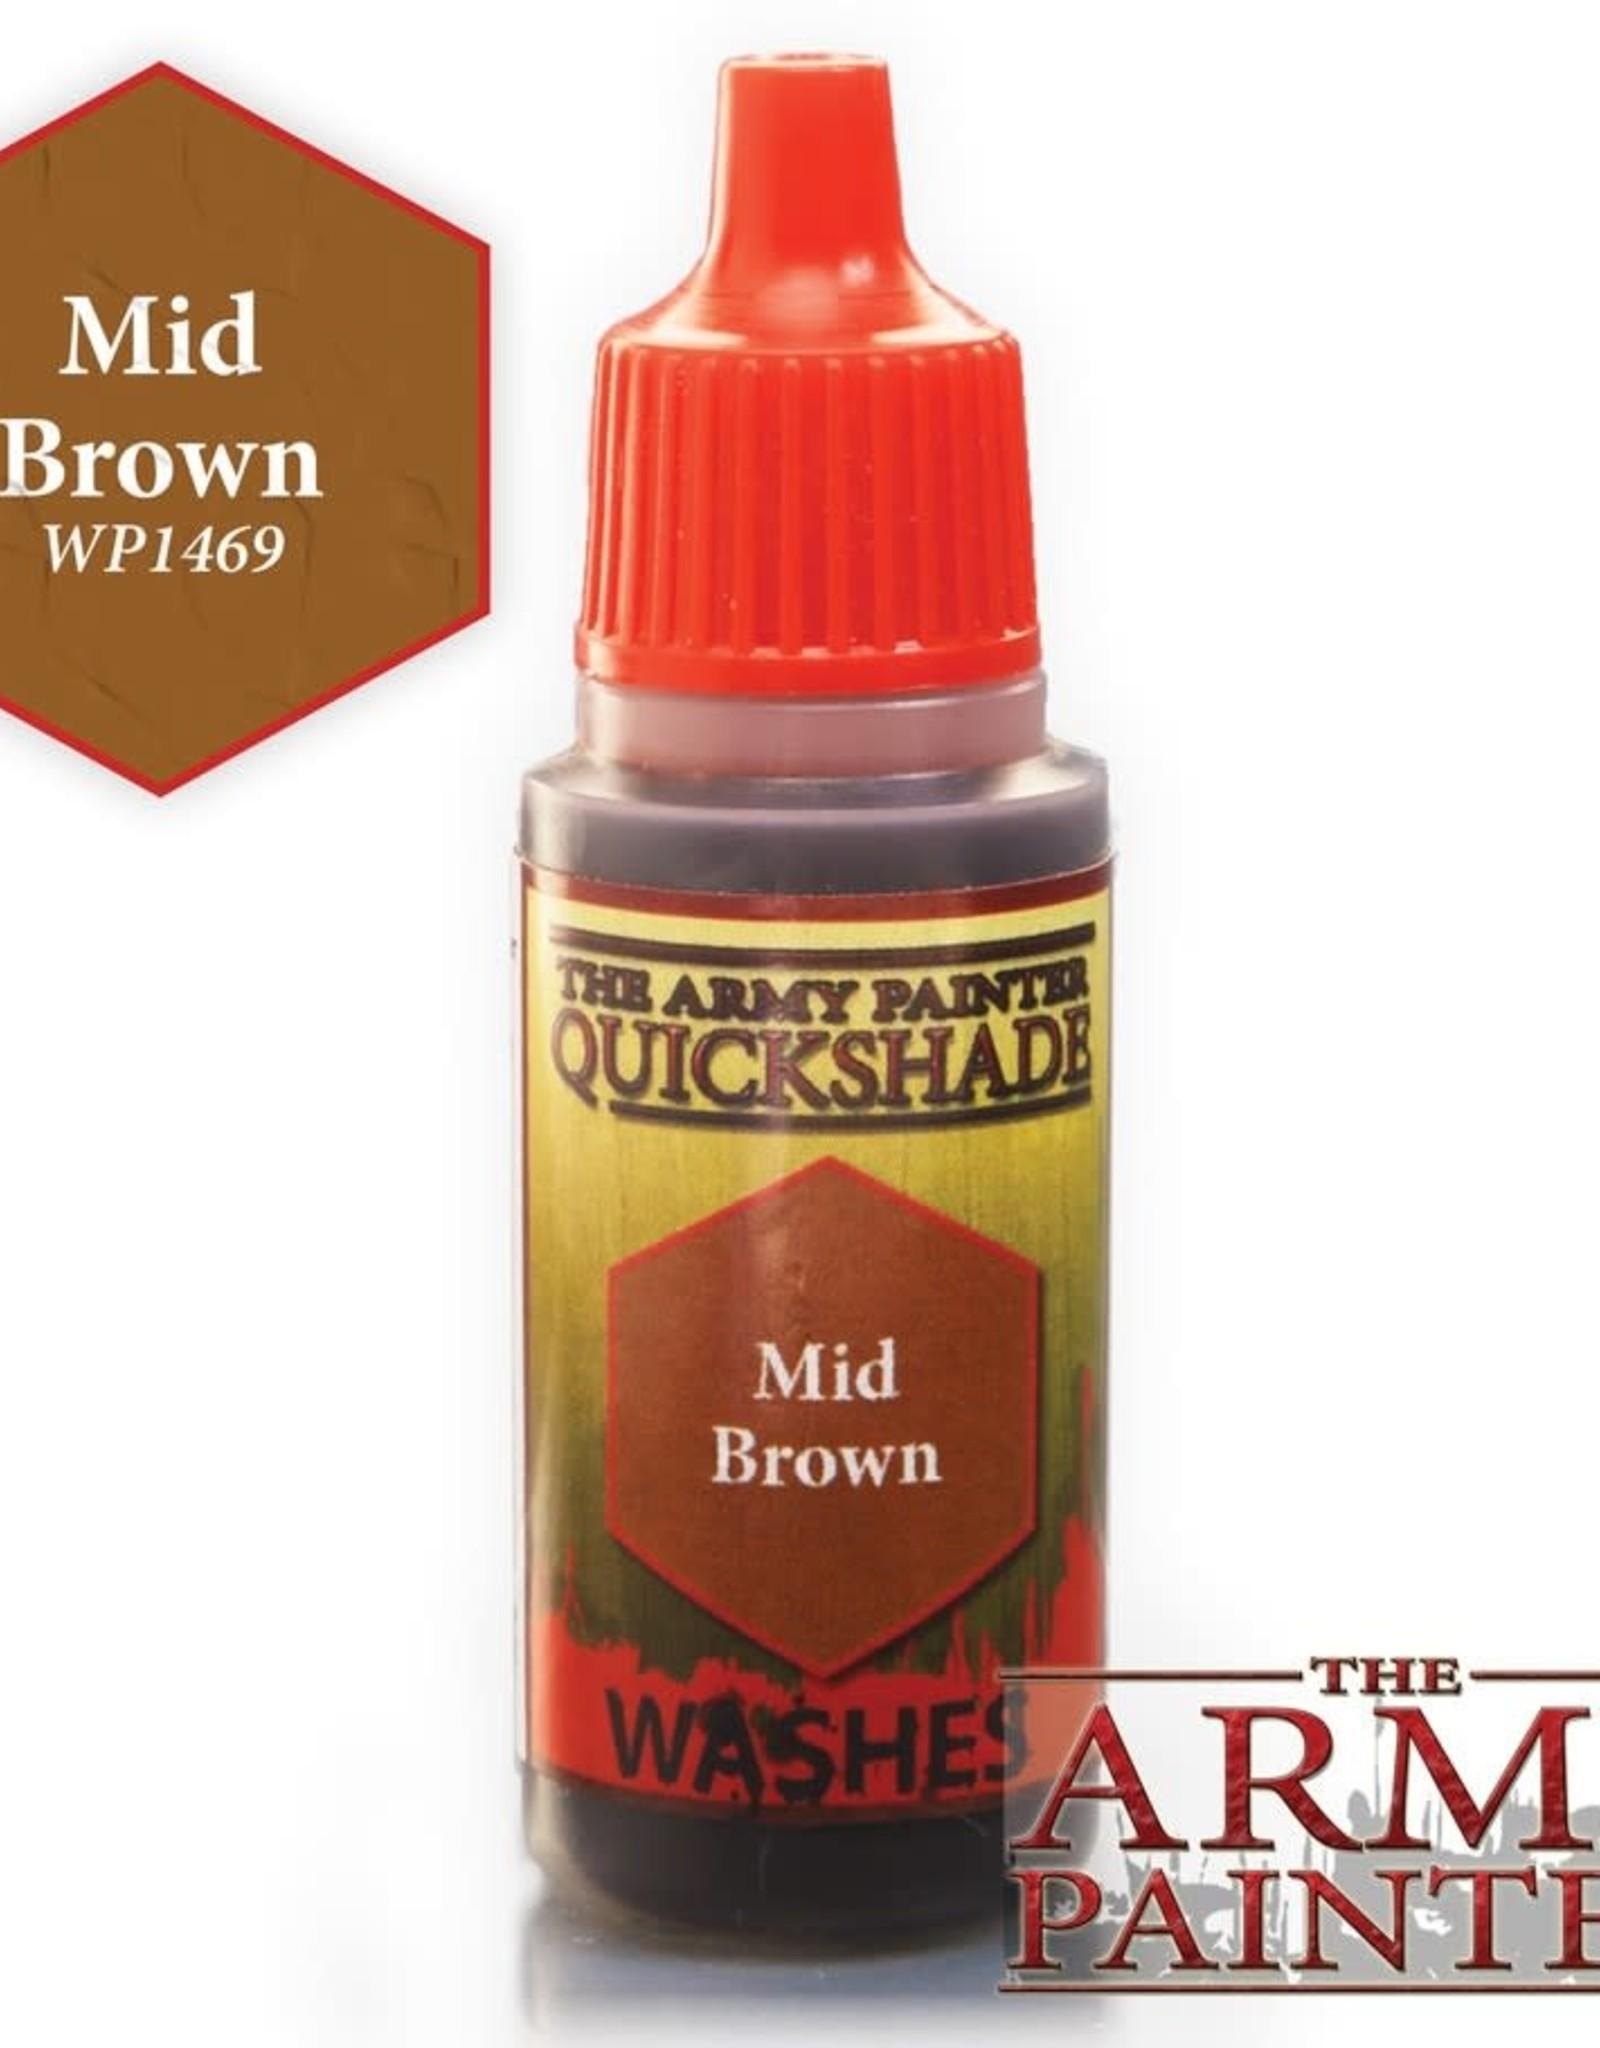 Quickshade: Mid Brown